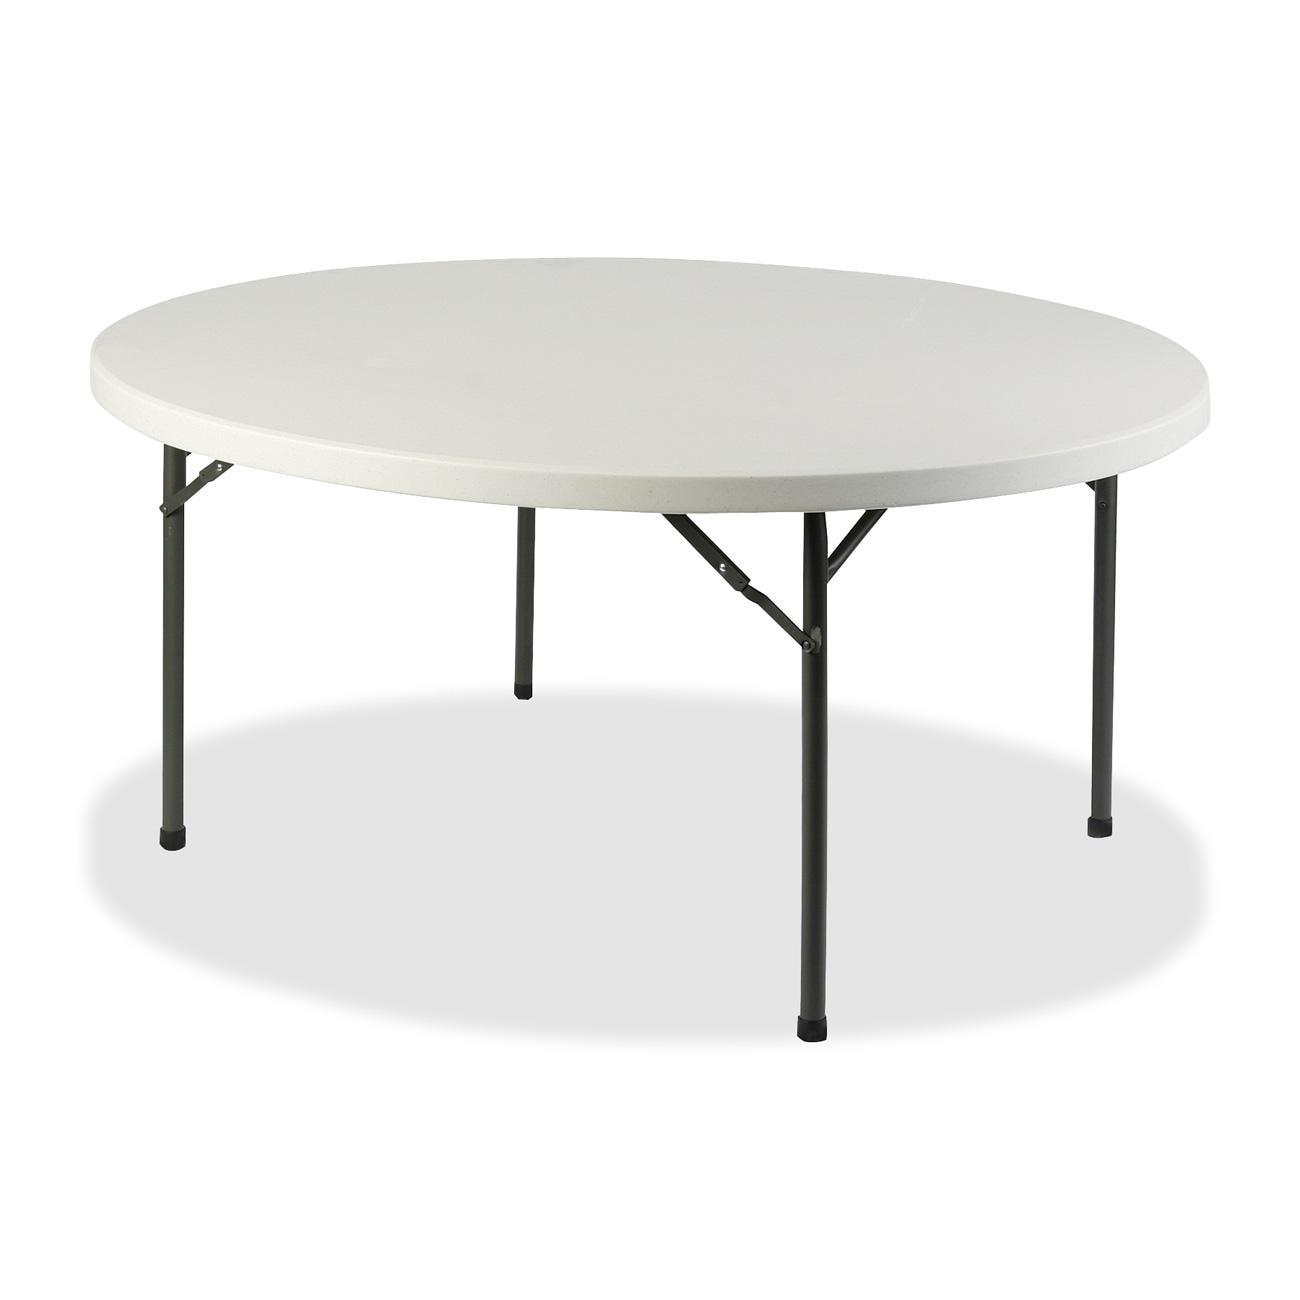 Lorell Platinum 60-inch Round Banquet Folding Table (LLR6...